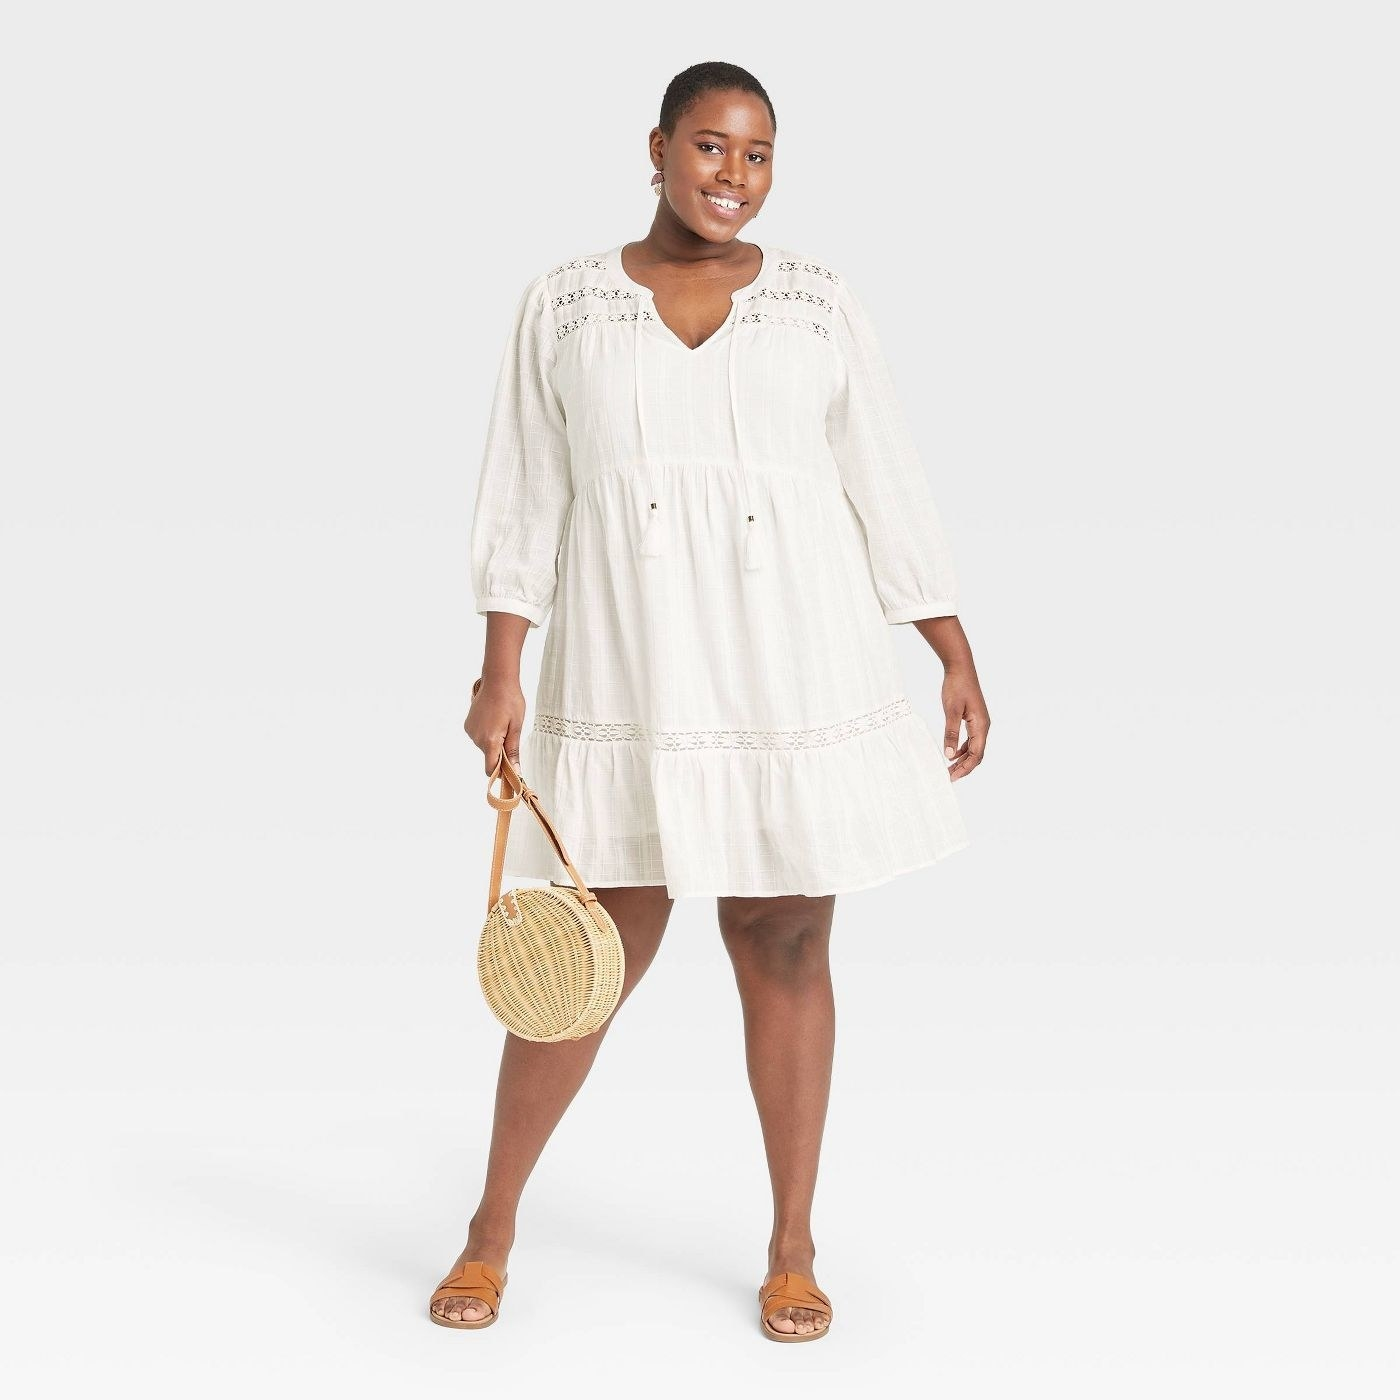 Model wearing white dress with tassels